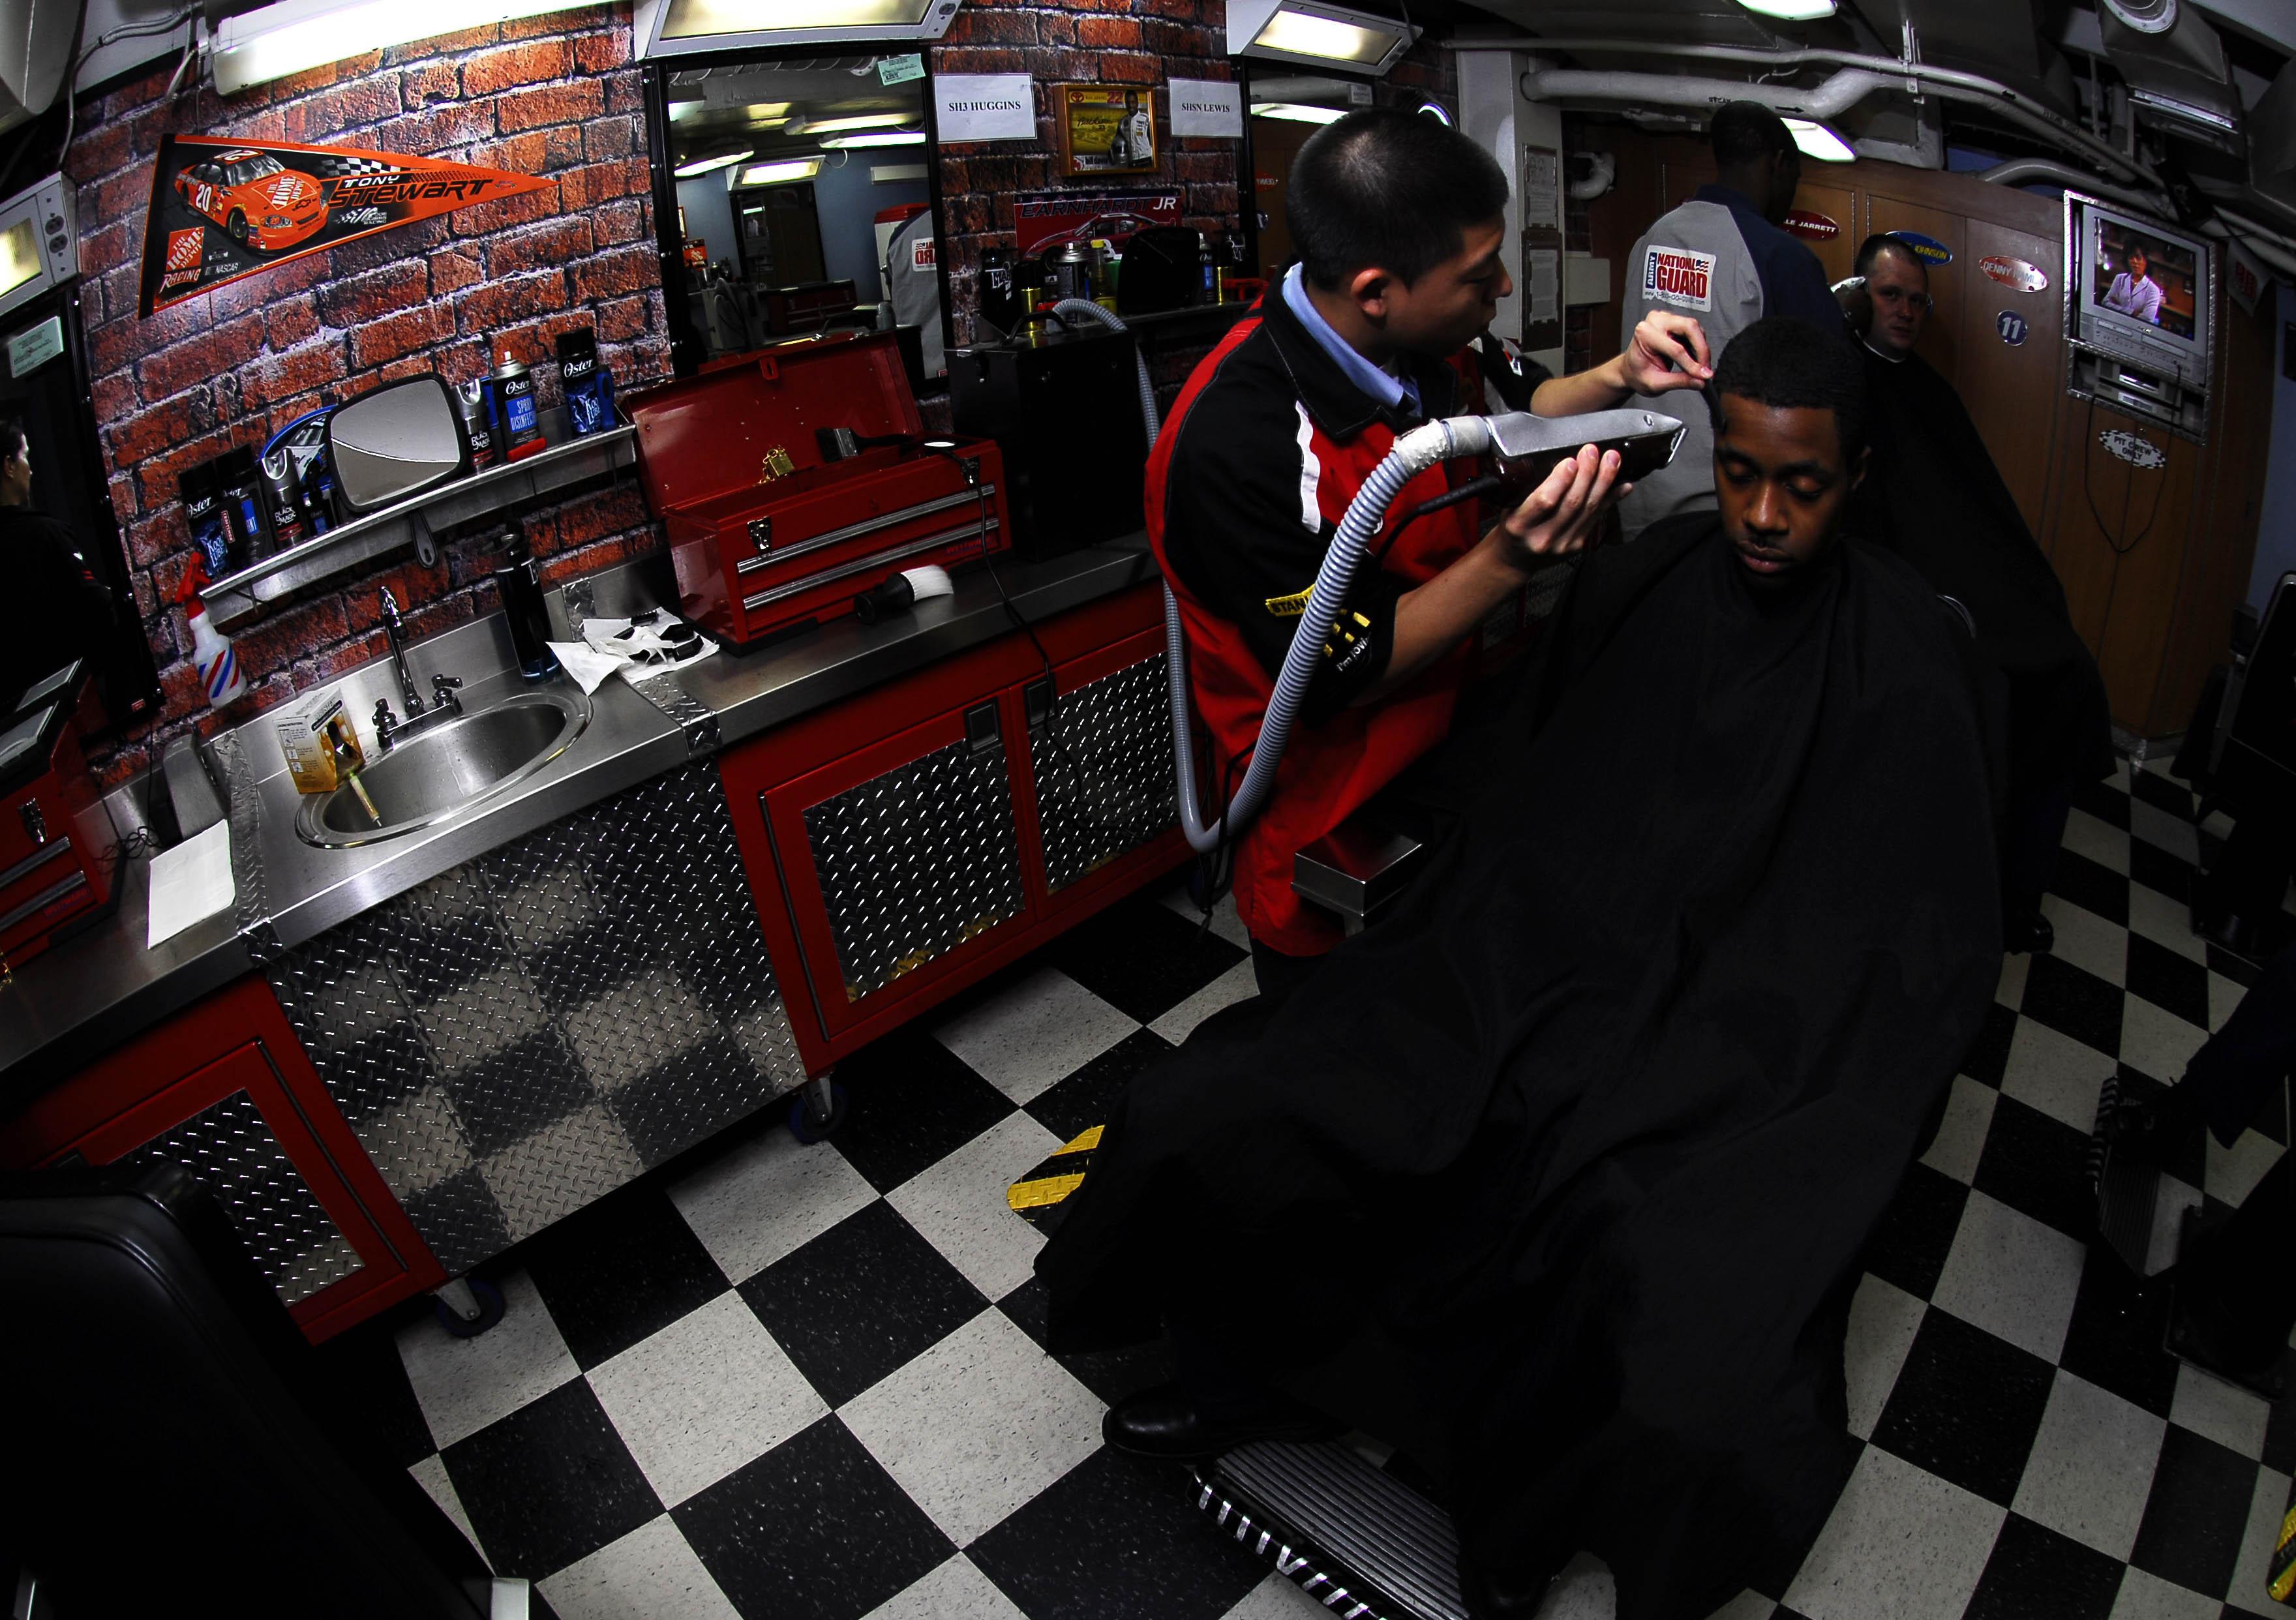 gratis date barbert nedentil